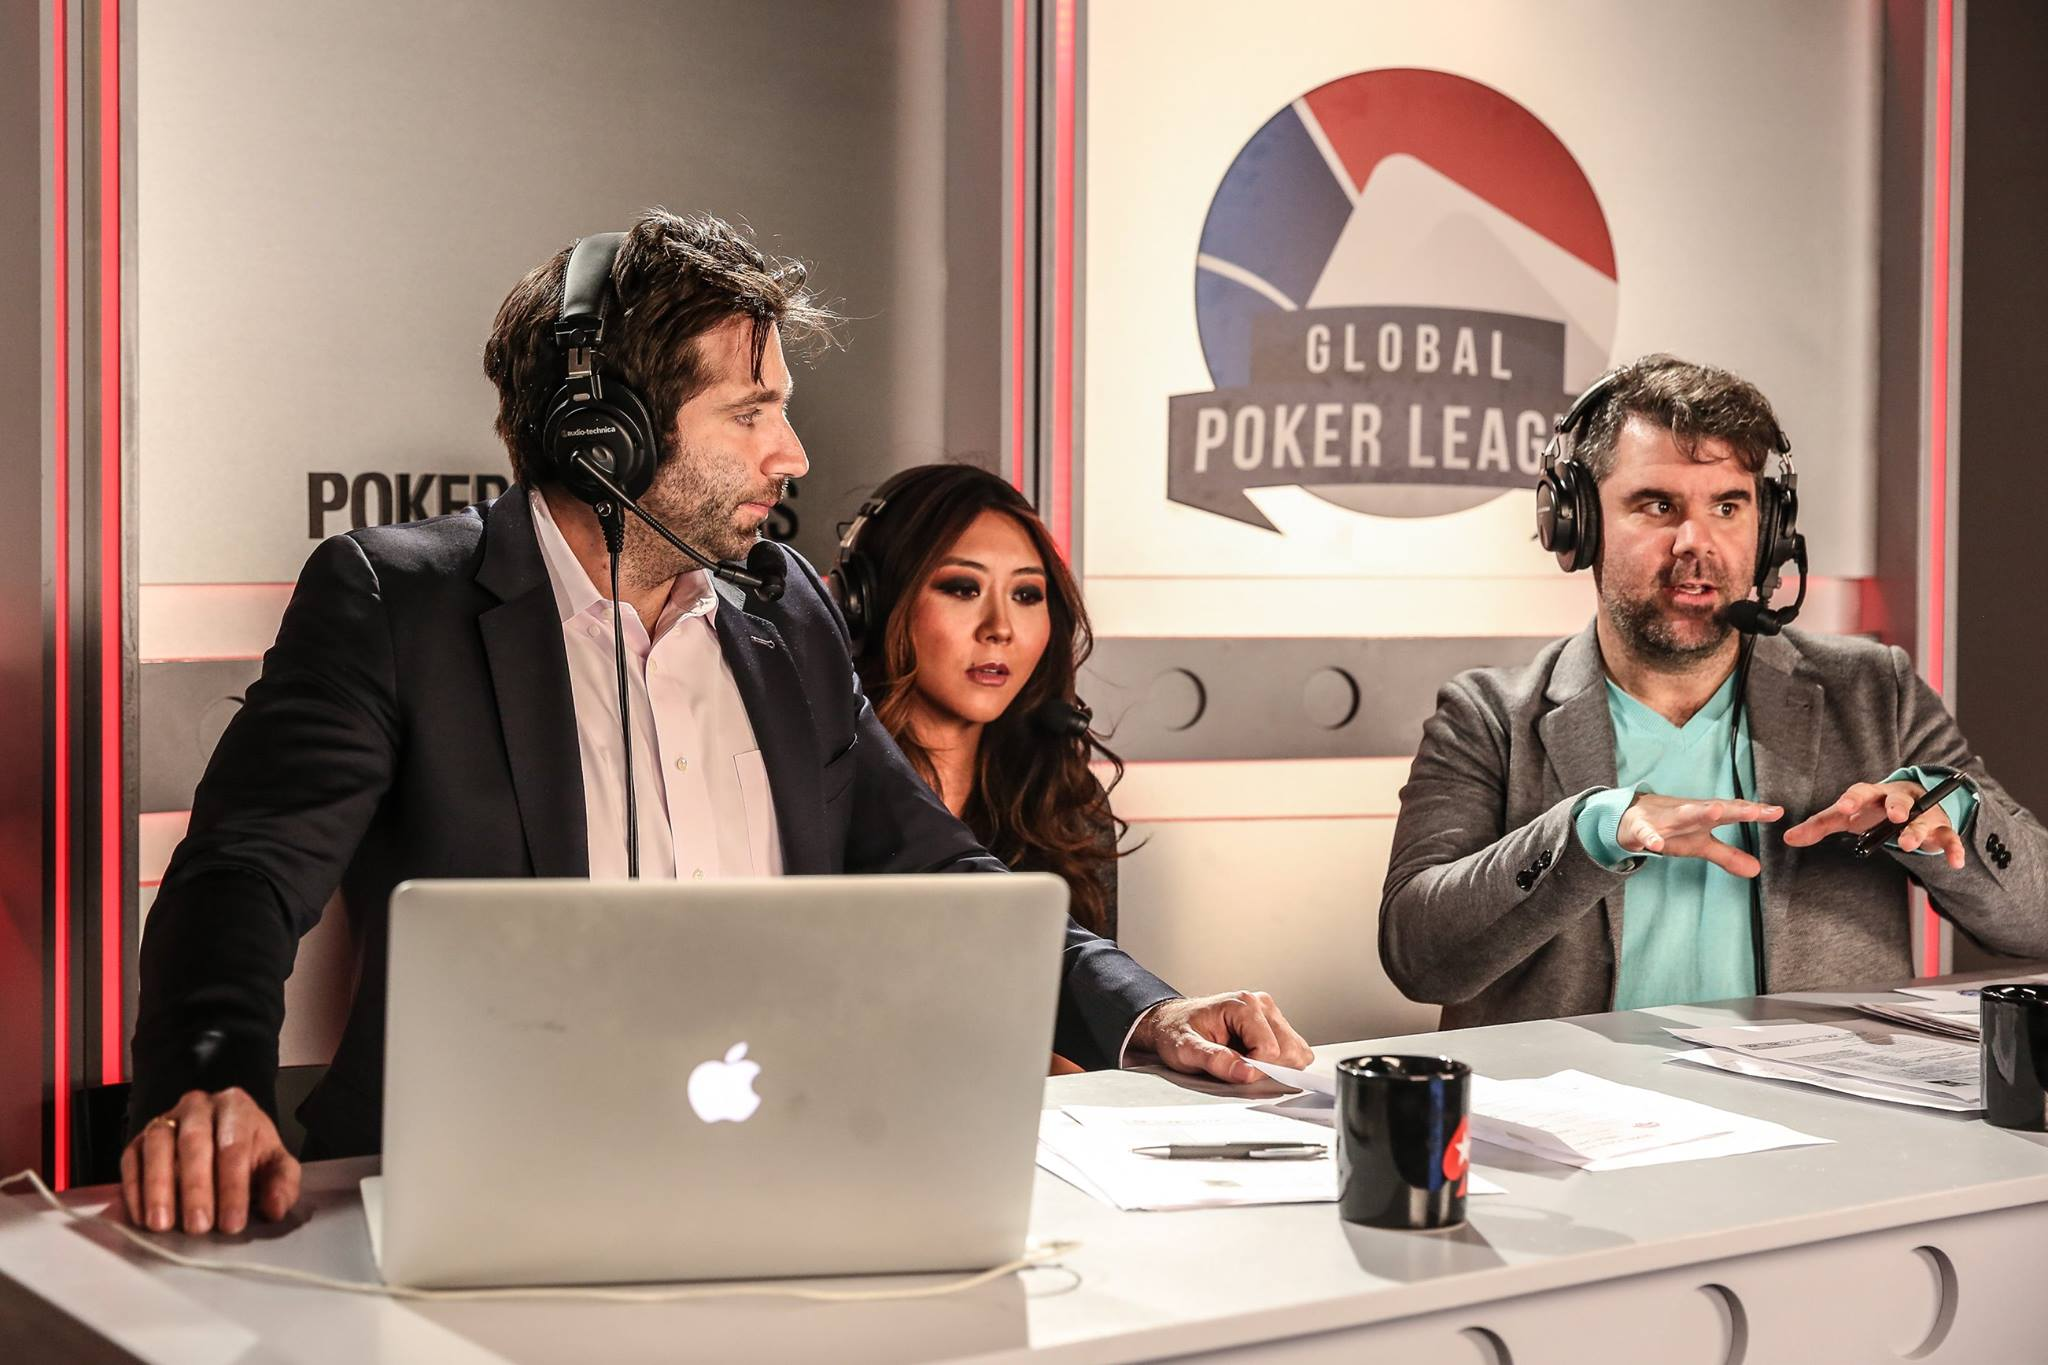 Editorial: Global Poker League Had an Unremarkable First Season 102